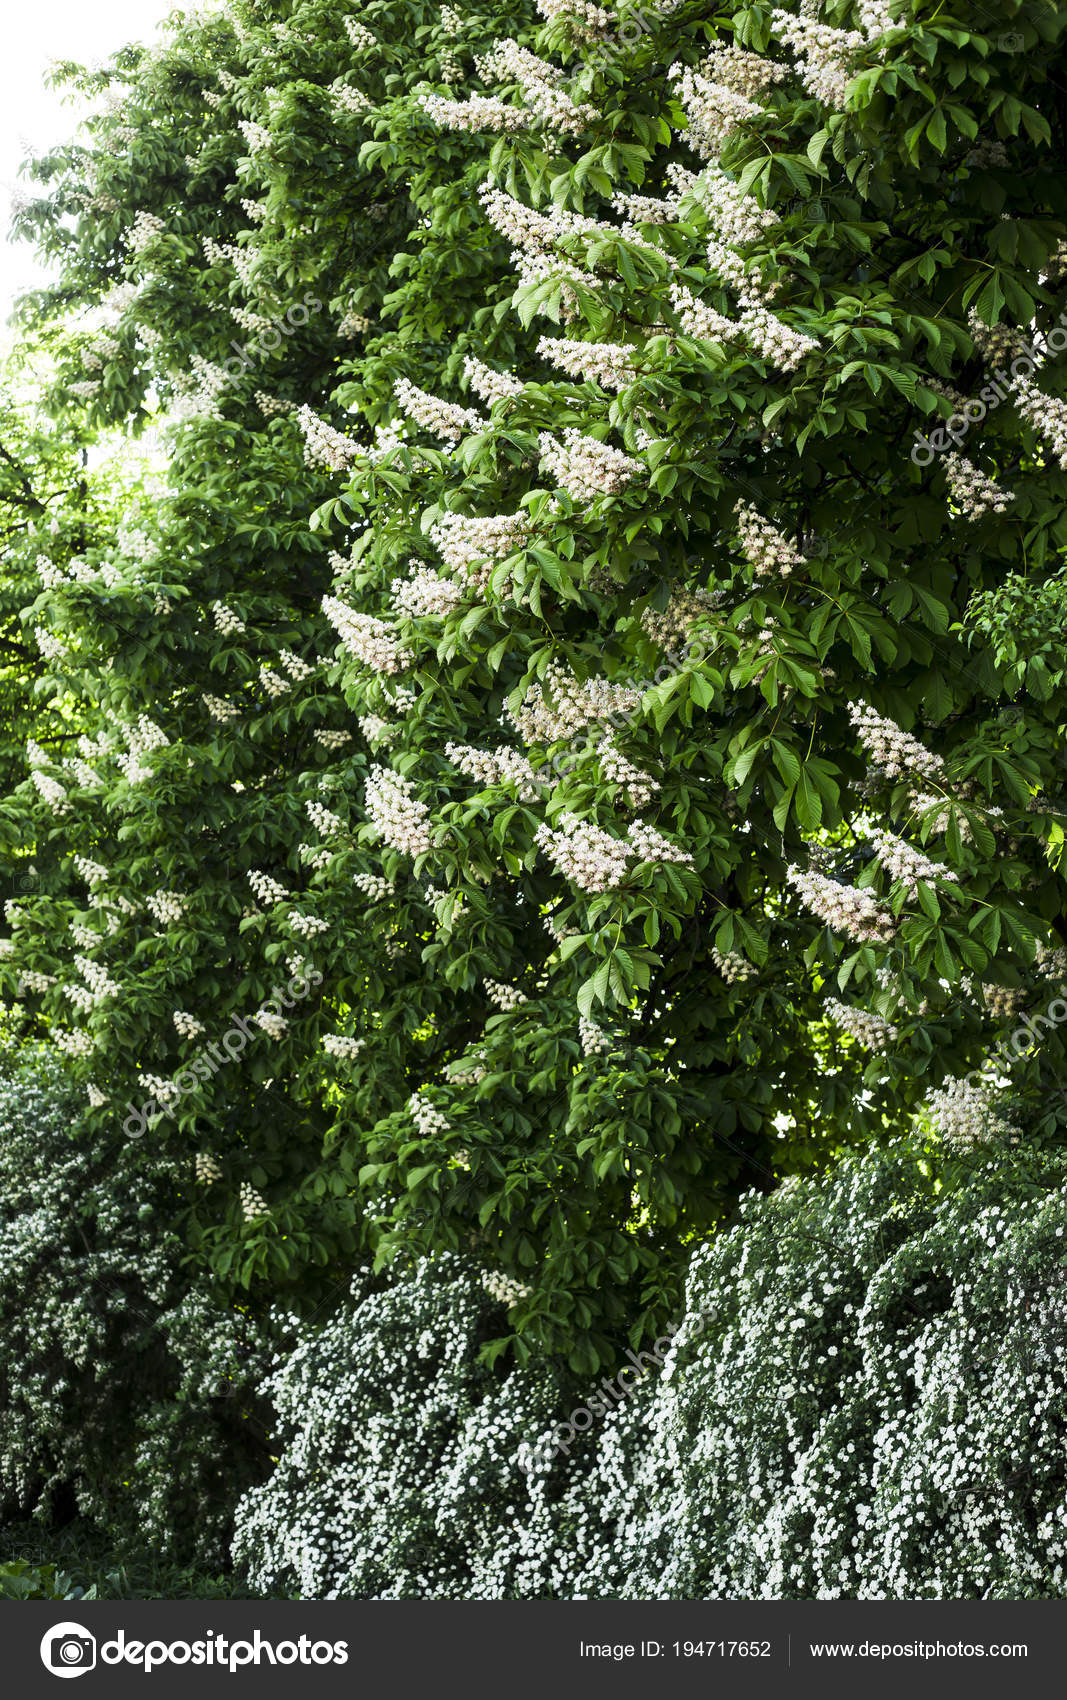 White flowering bushes next large flowering chestnuts spring kiev white flowering bushes next large flowering chestnuts spring kiev stock photo mightylinksfo